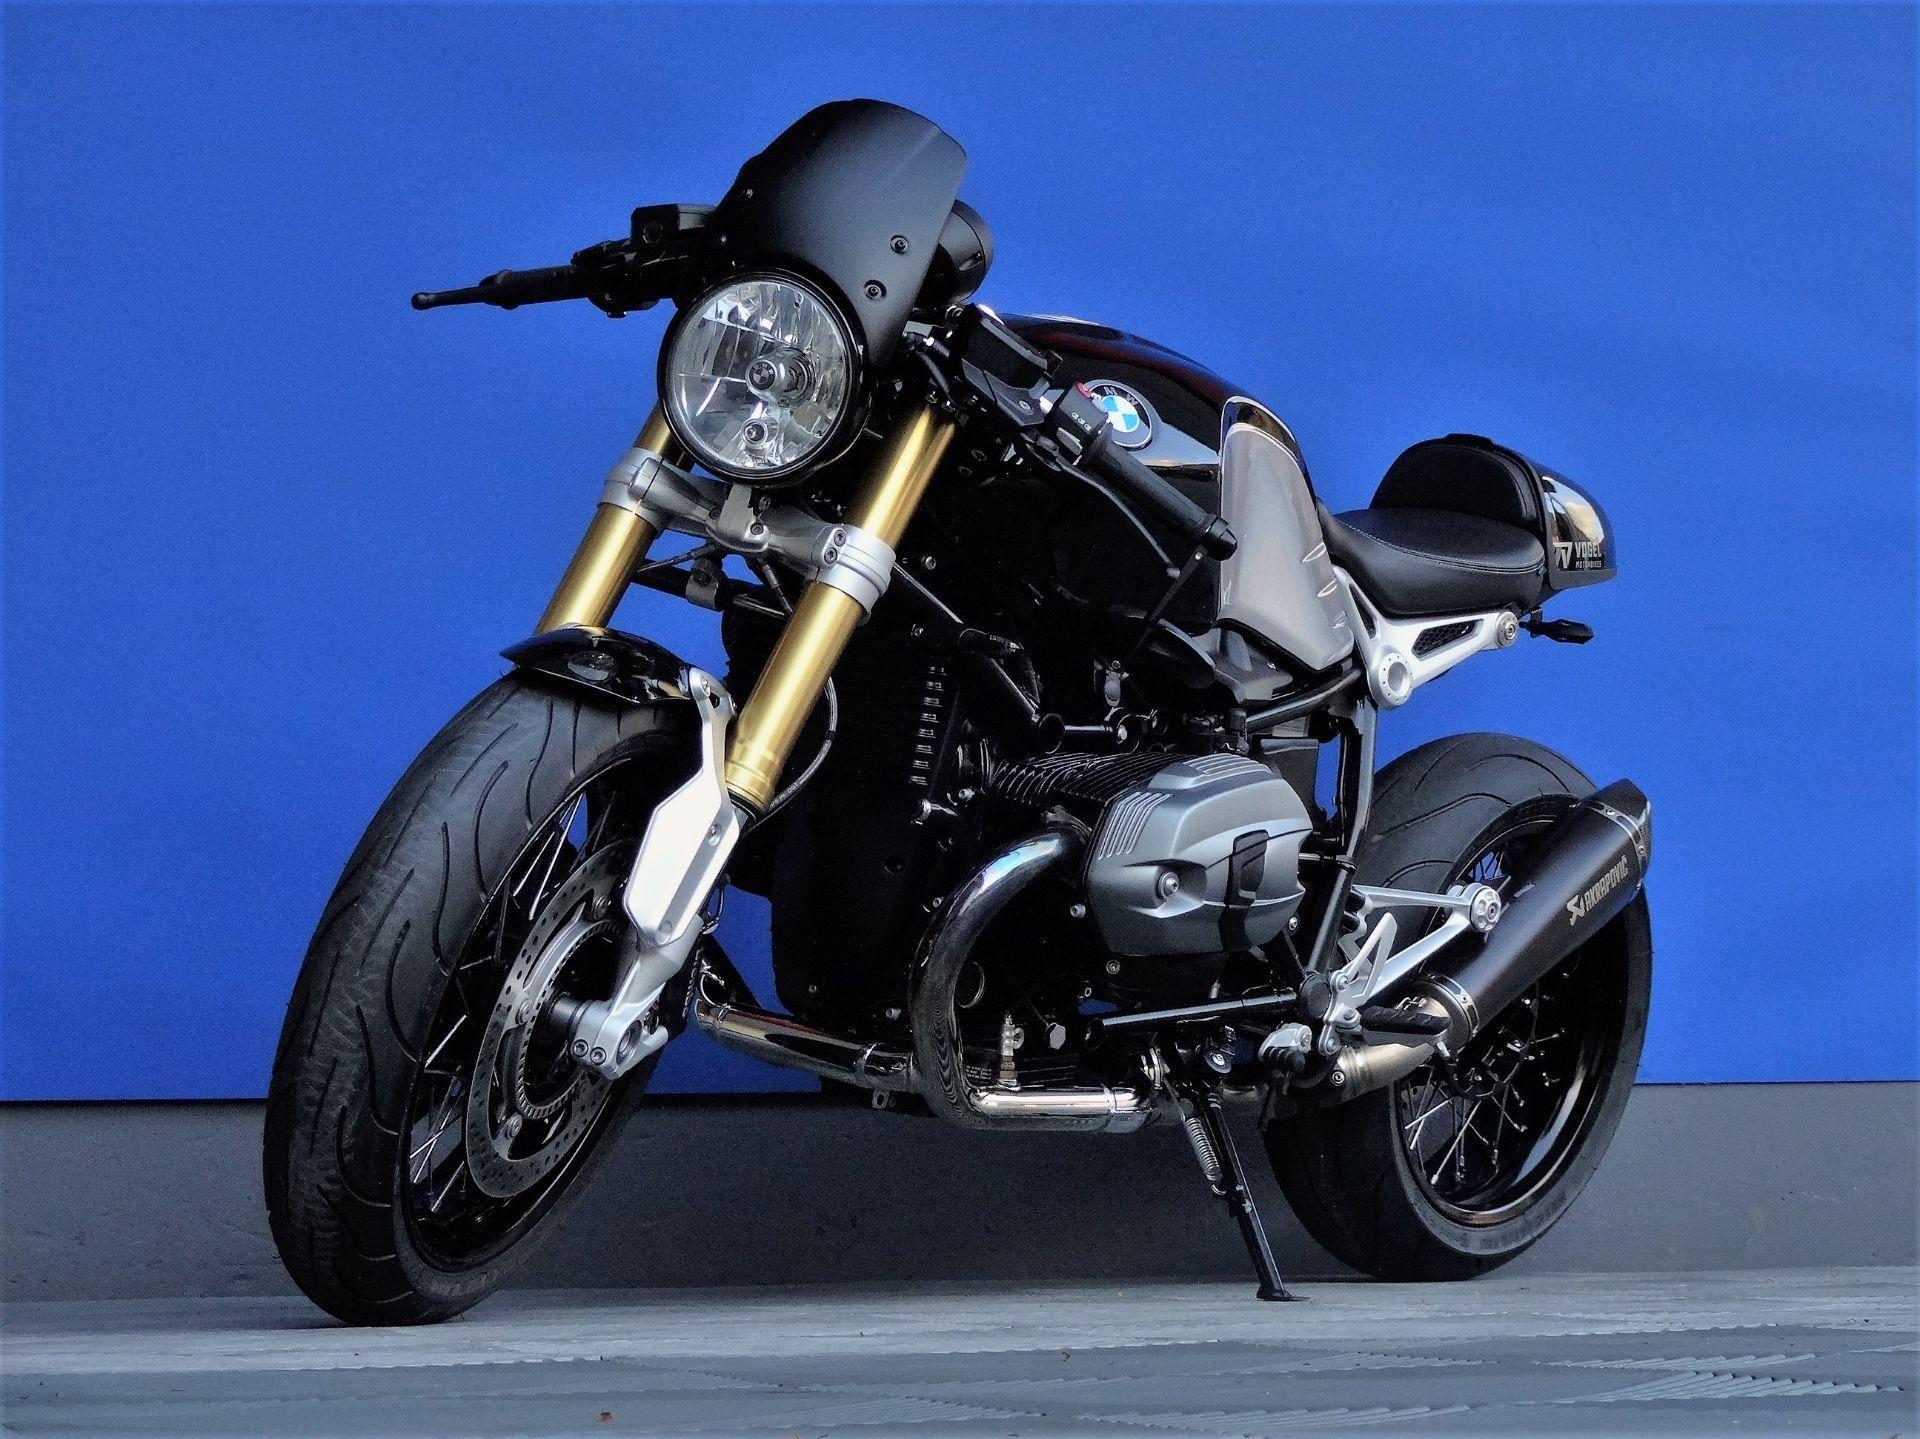 bmw r nine t abs cafe racer vogel motorbikes sch pfheim occasions. Black Bedroom Furniture Sets. Home Design Ideas